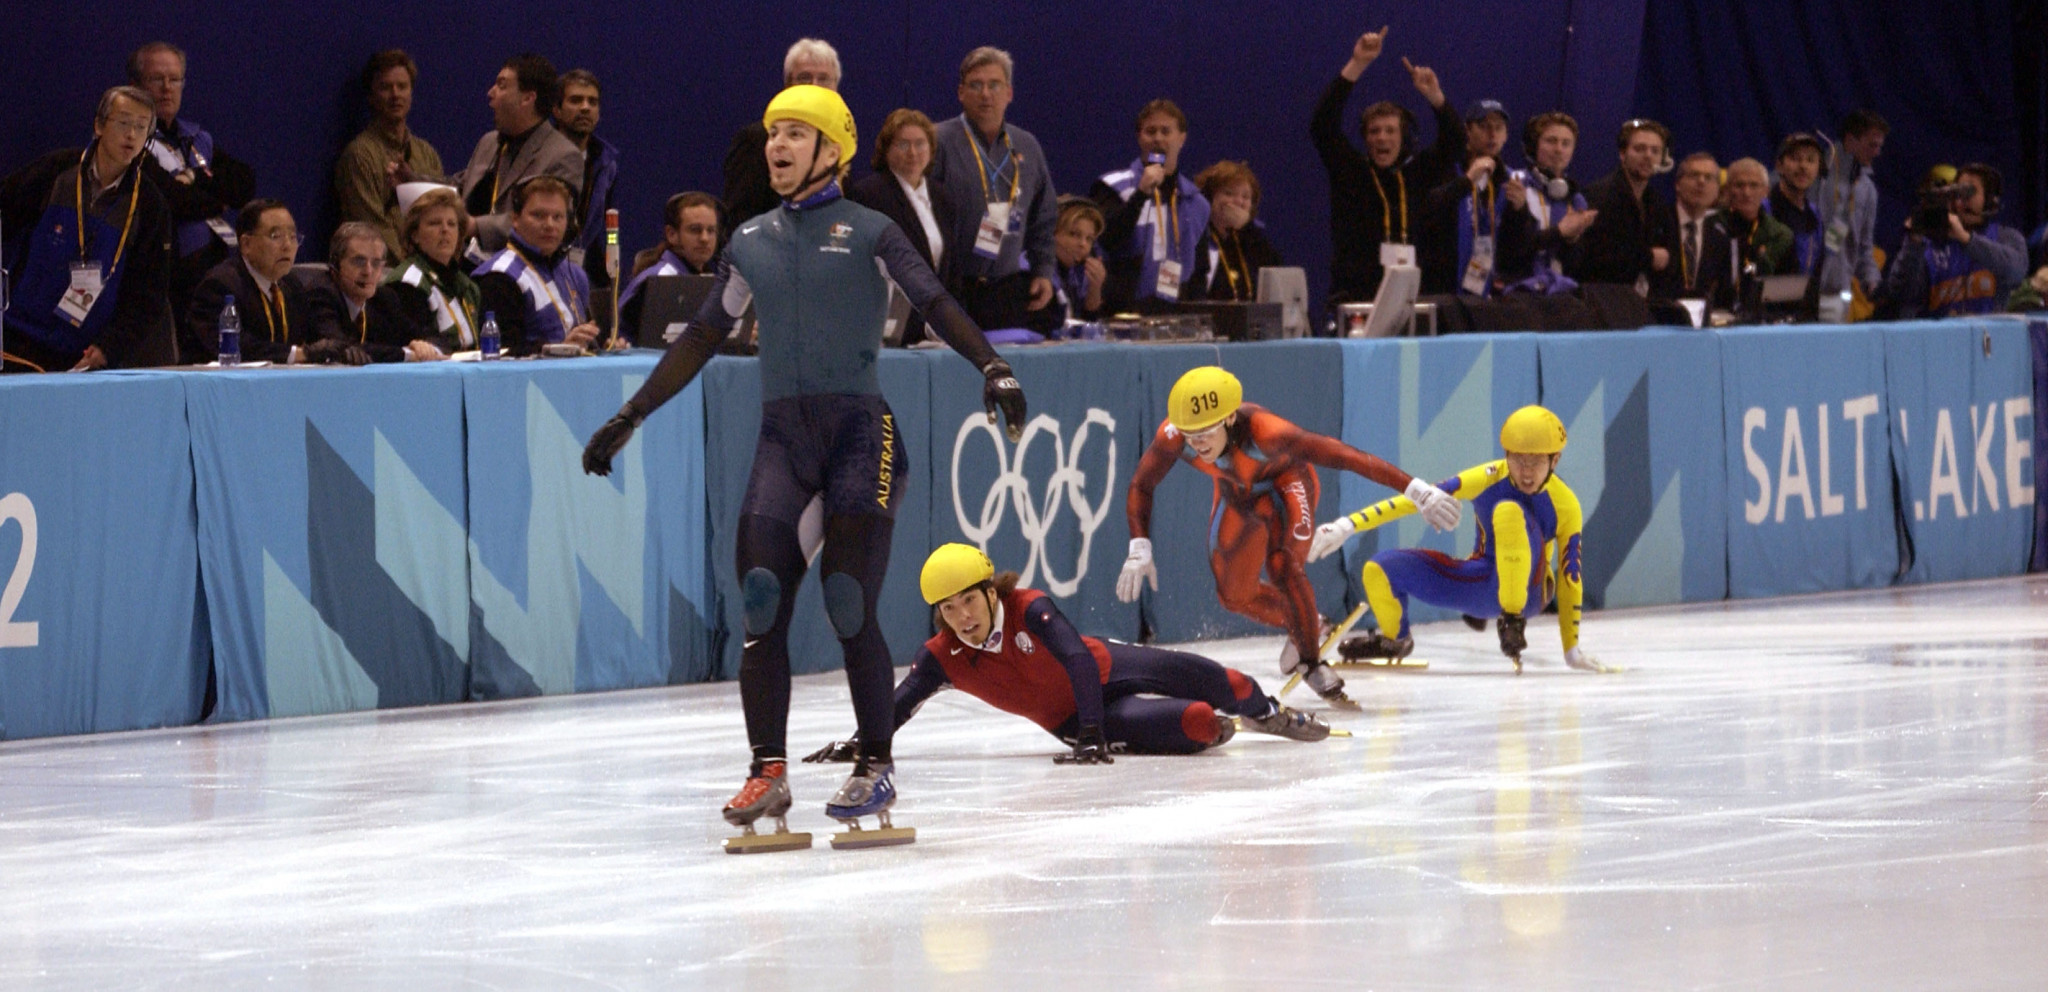 Last Man Standing, film about Australia's shock 2002 Winter Olympic short track champion Bradbury, secures funding